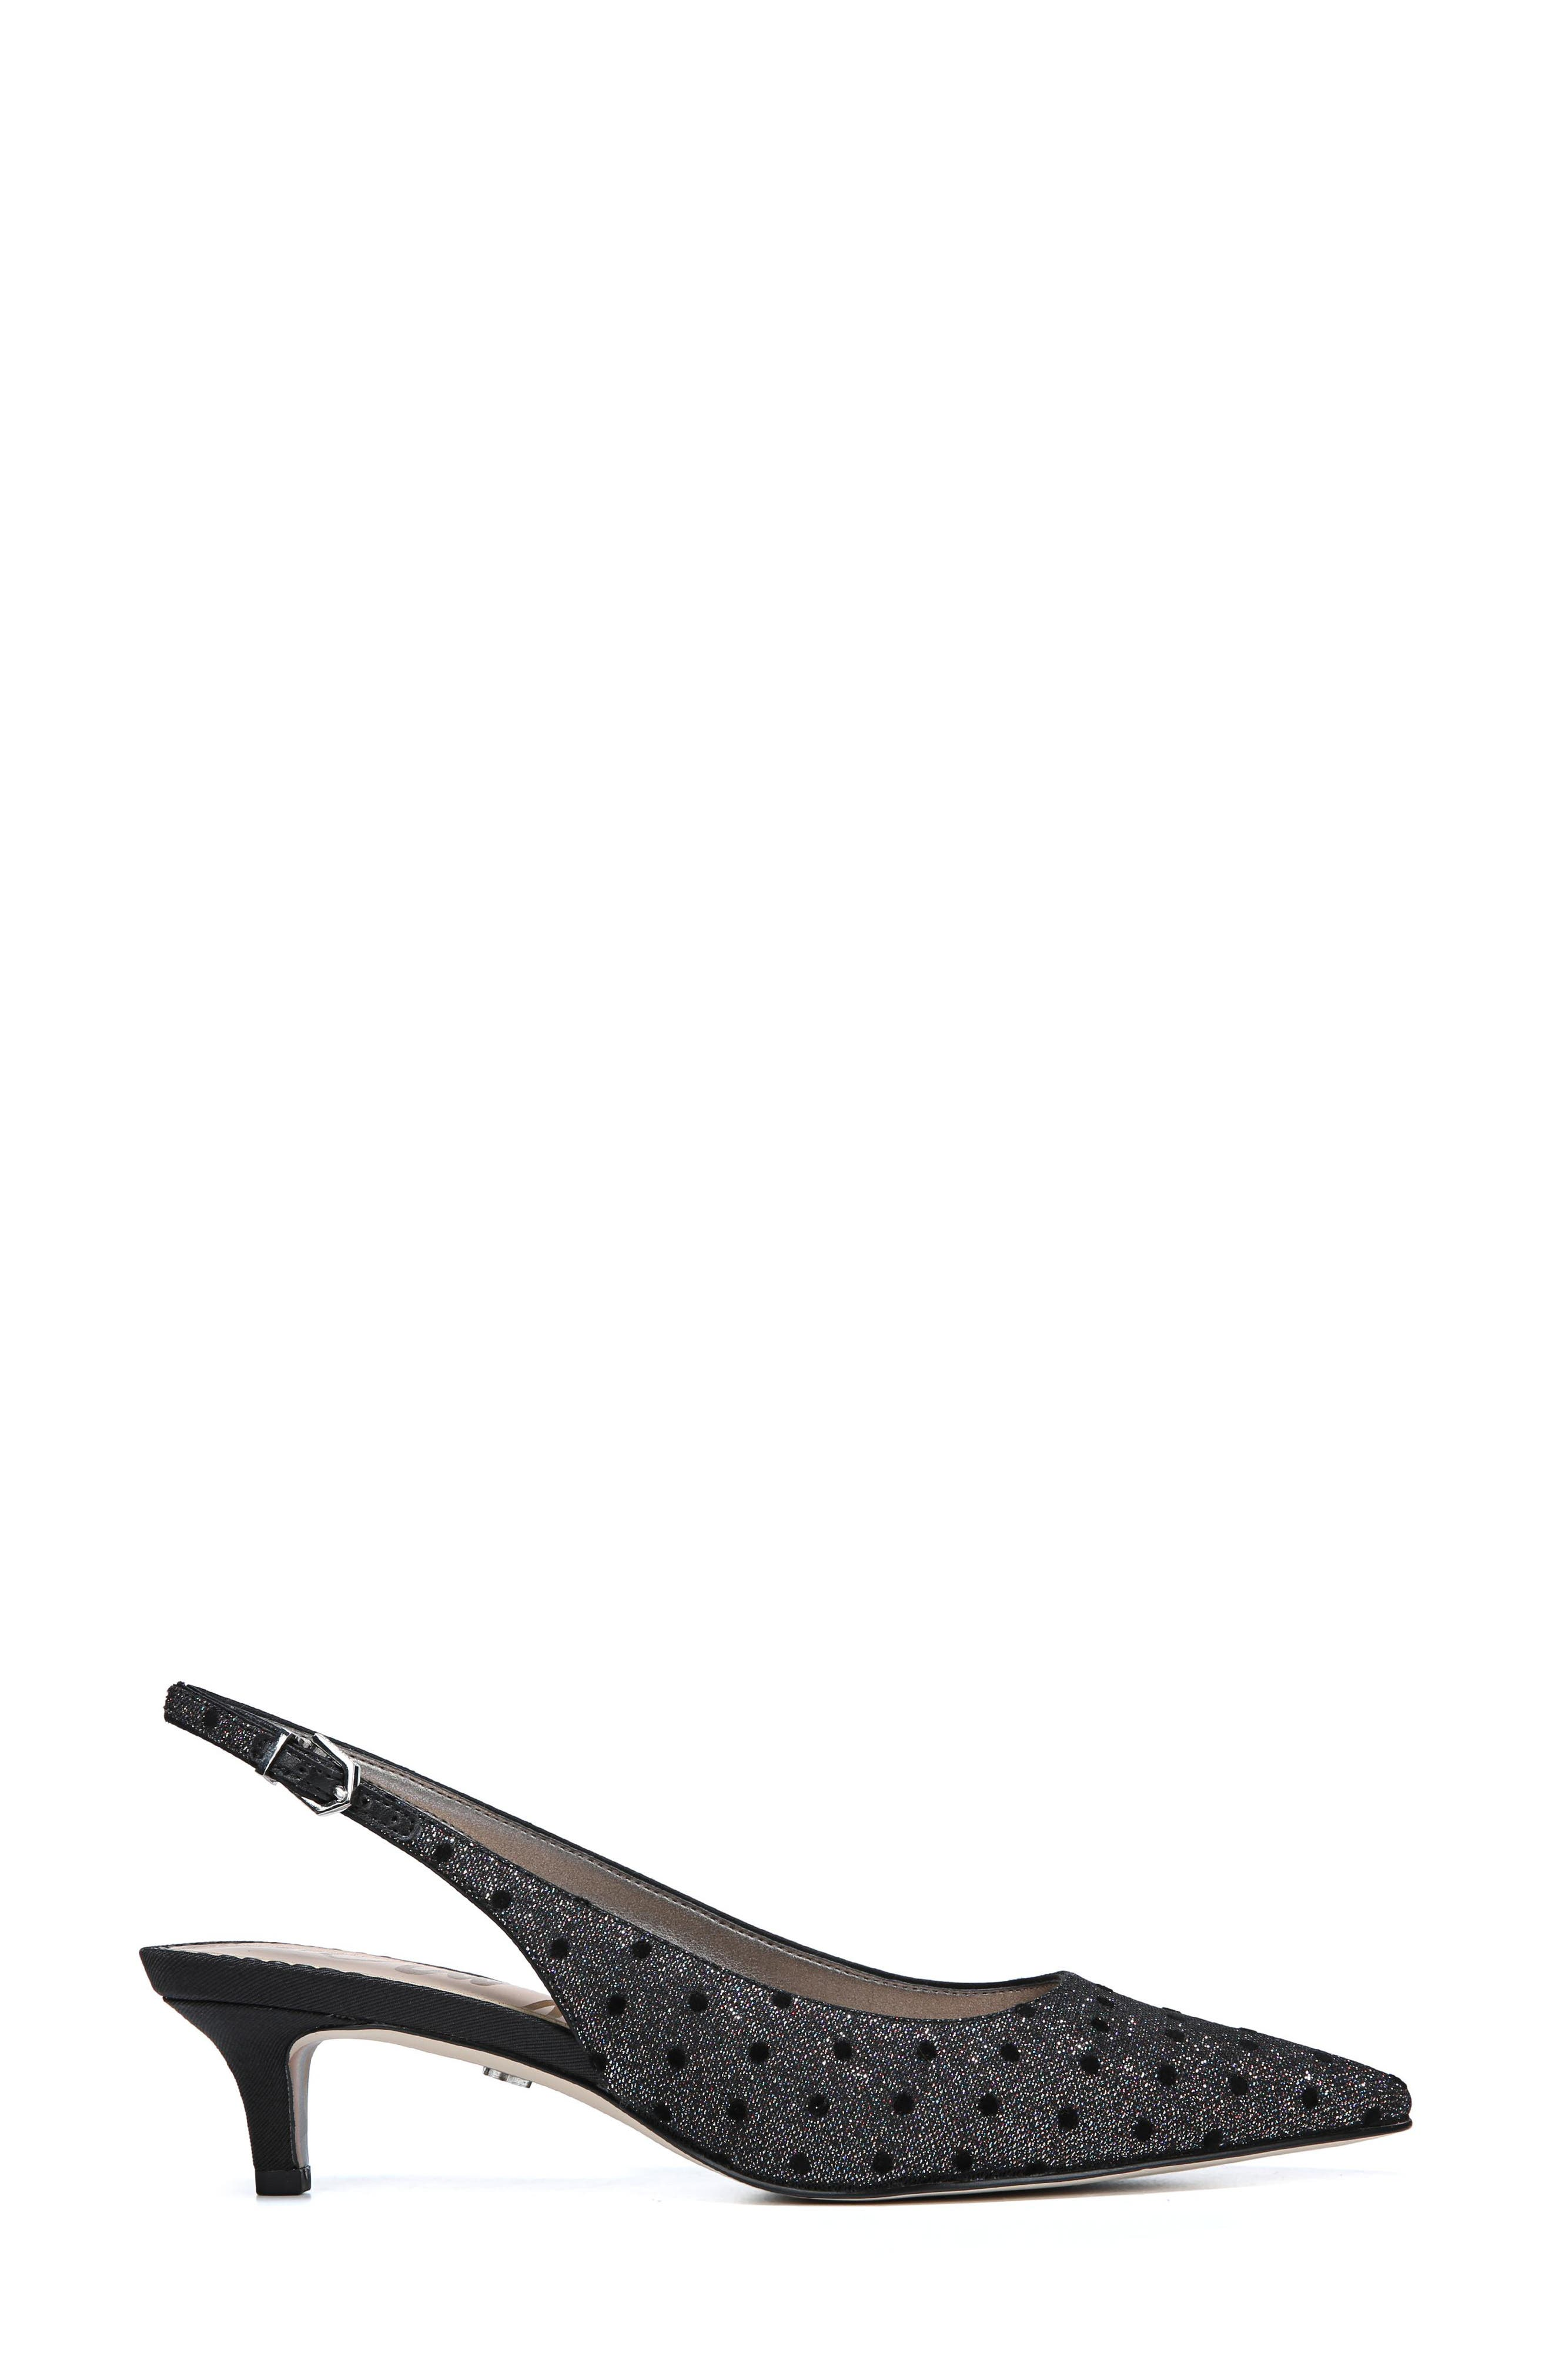 Ludlow Slingback Pump,                             Alternate thumbnail 3, color,                             METALLIC GLITTER